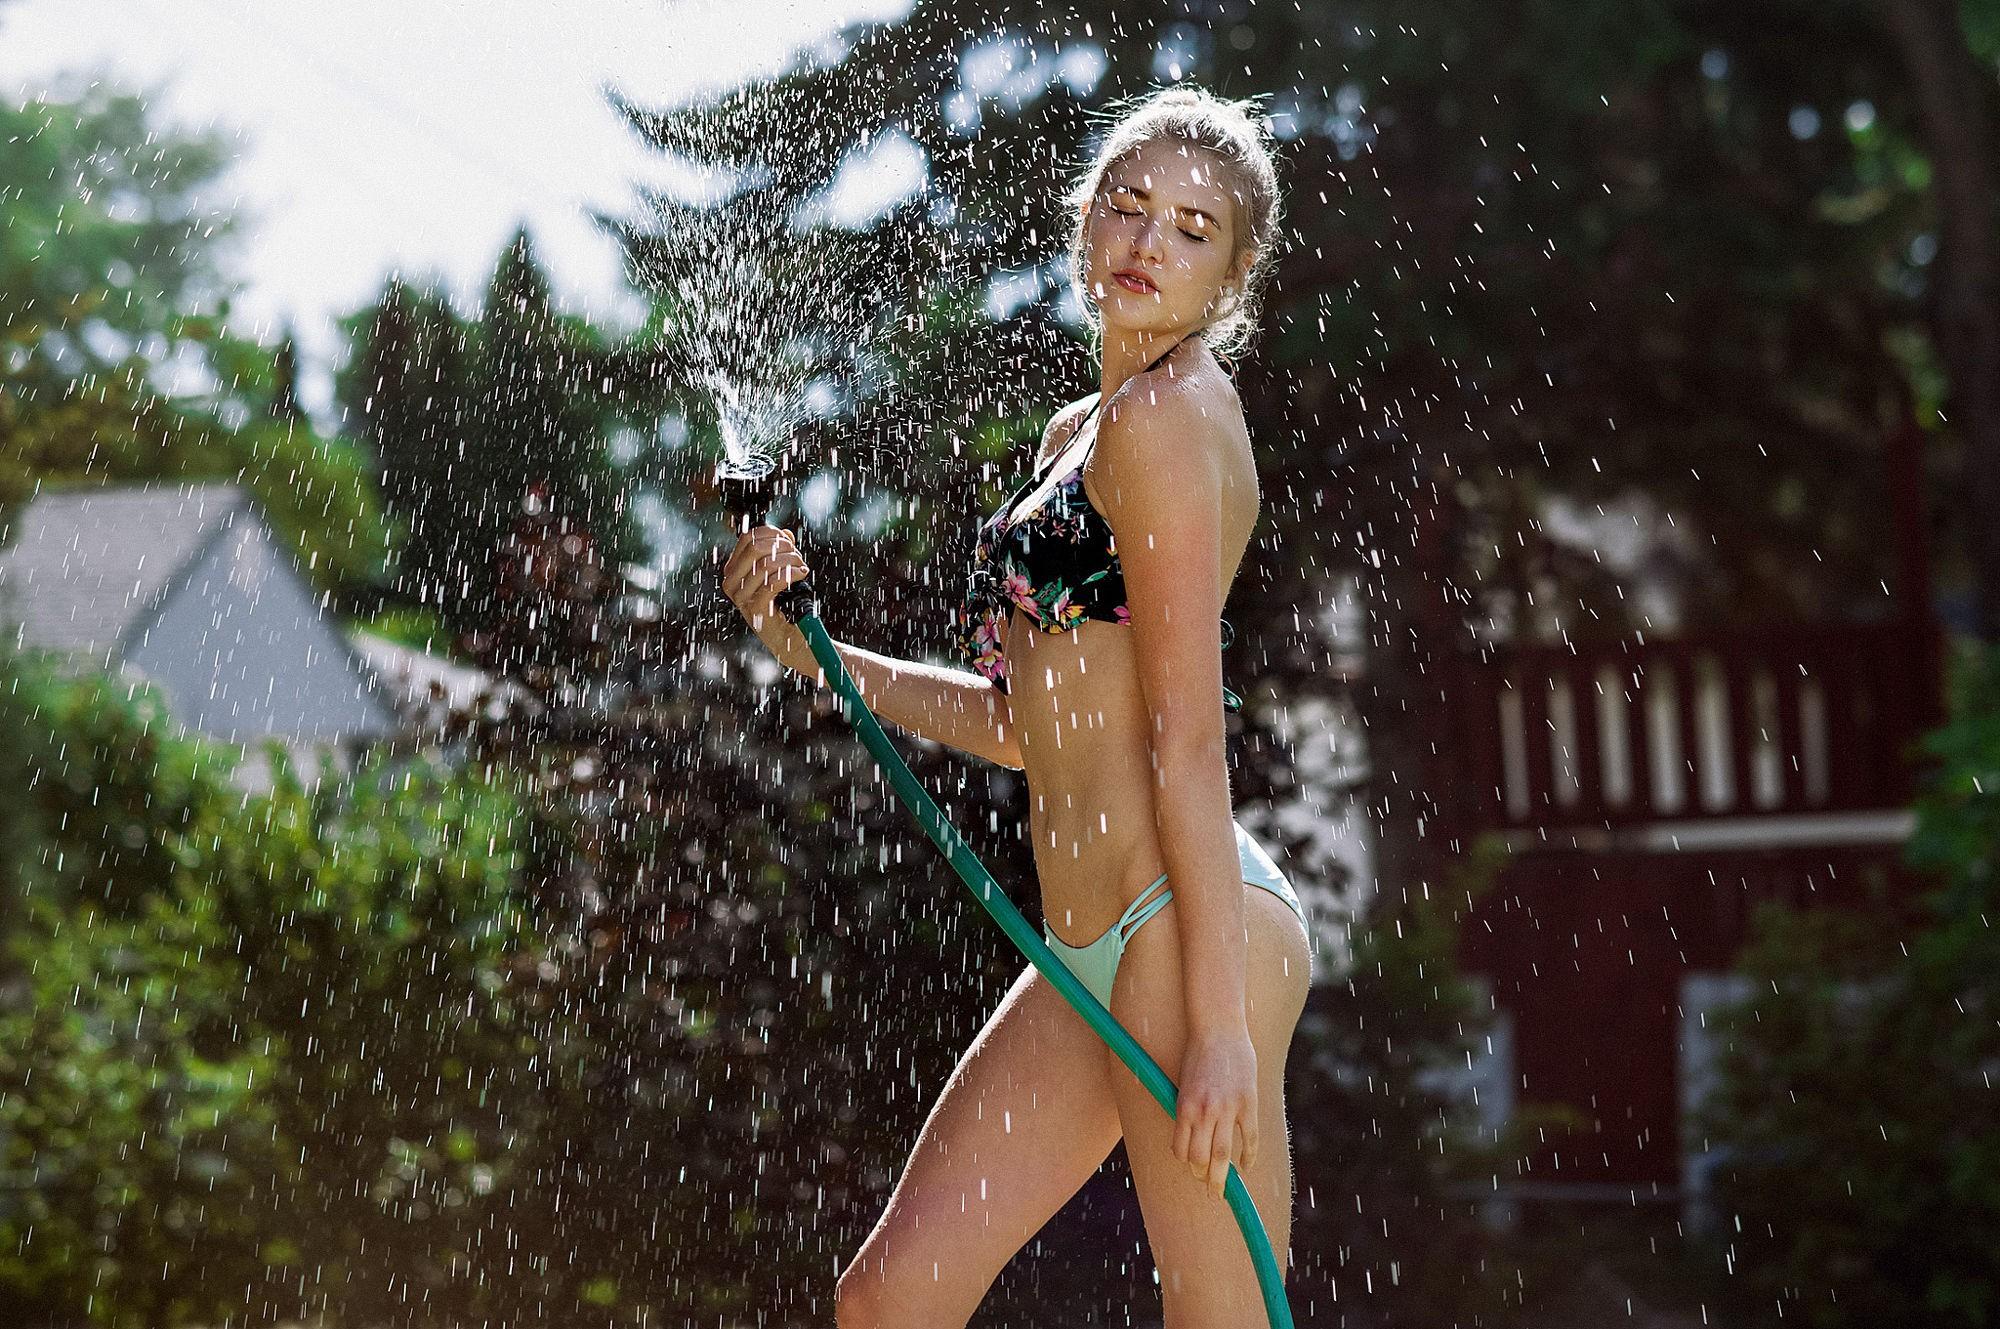 People 2000x1329 watering splashes water splash women closed eyes model blonde depth of field summer bikini wet body wet hair